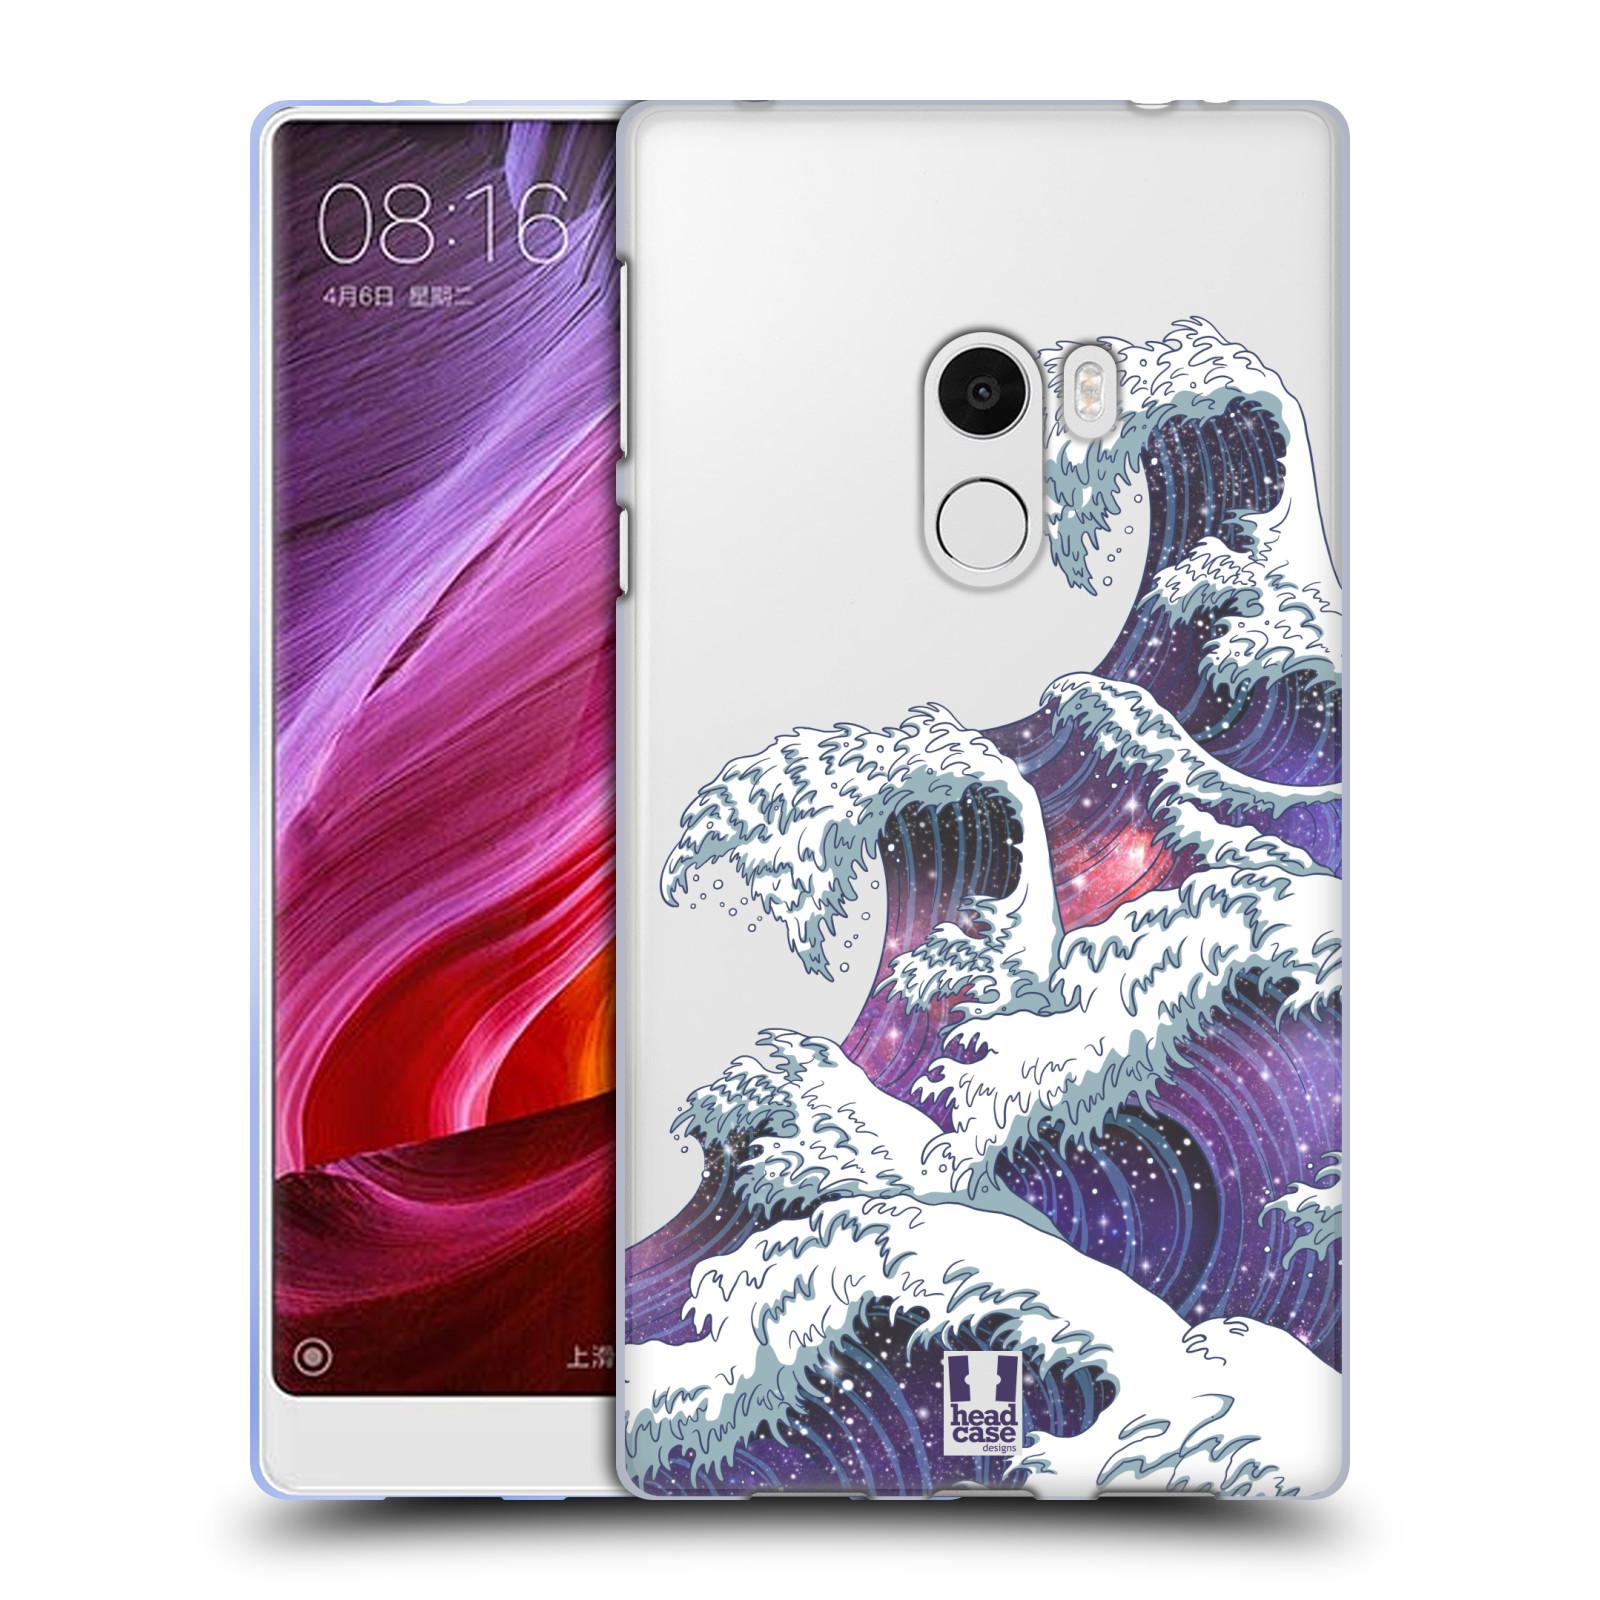 HEAD-CASE-DESIGNS-GALAXY-WAVES-SOFT-GEL-CASE-FOR-XIAOMI-PHONES